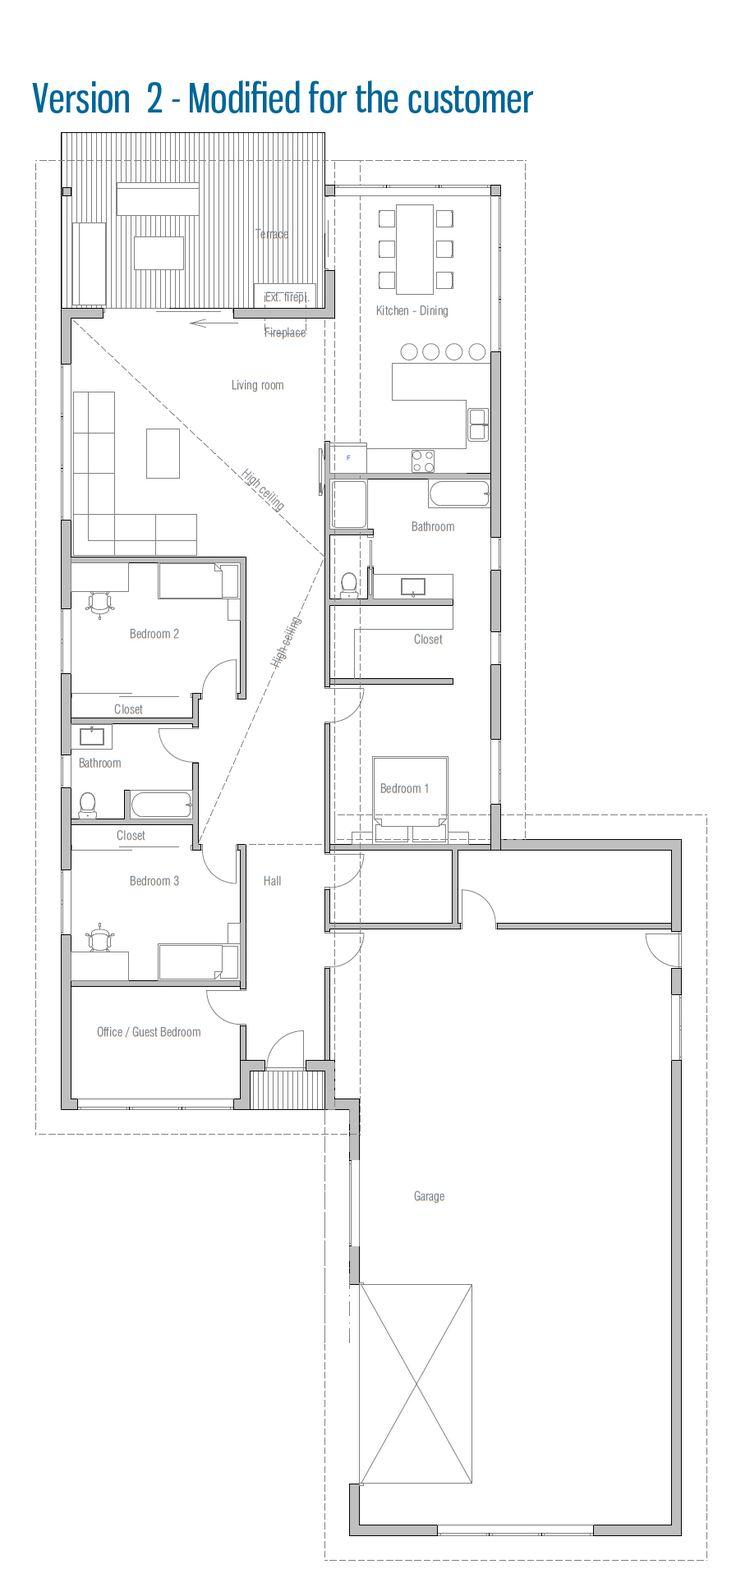 Modern Architecture House Floor Plans 220 best floor plans images on pinterest | floor plans, small